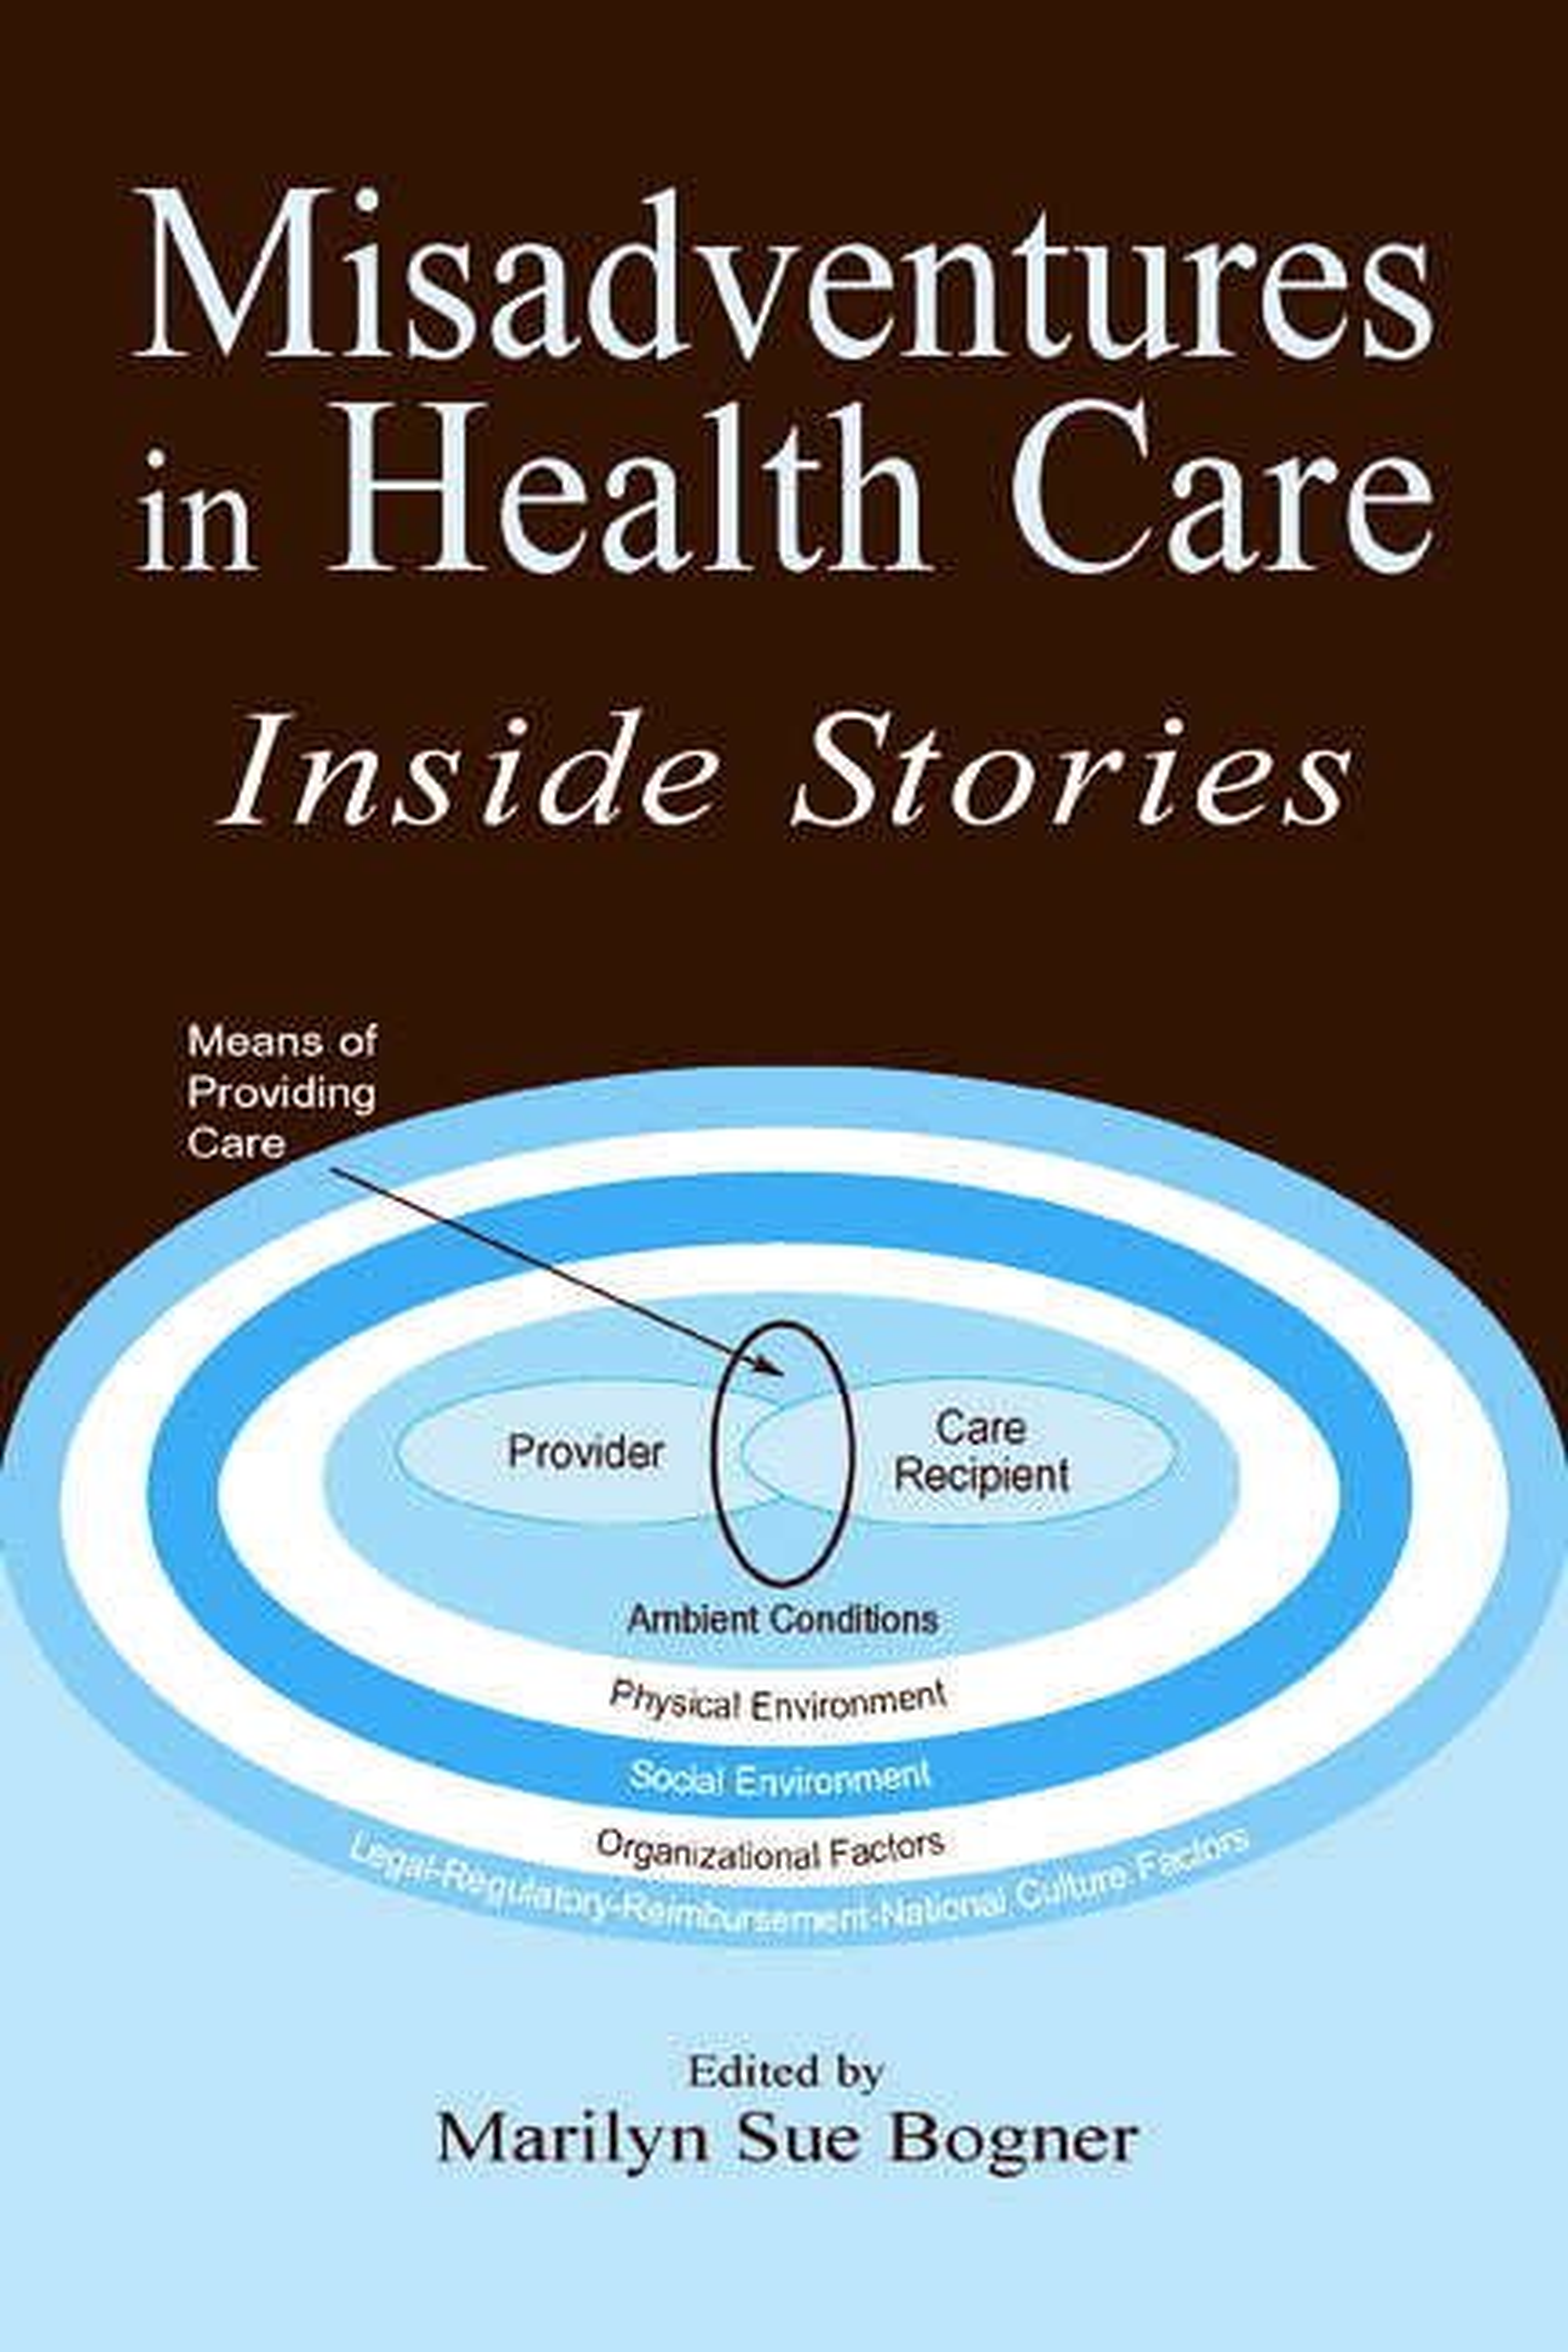 Misadventures in Health Care